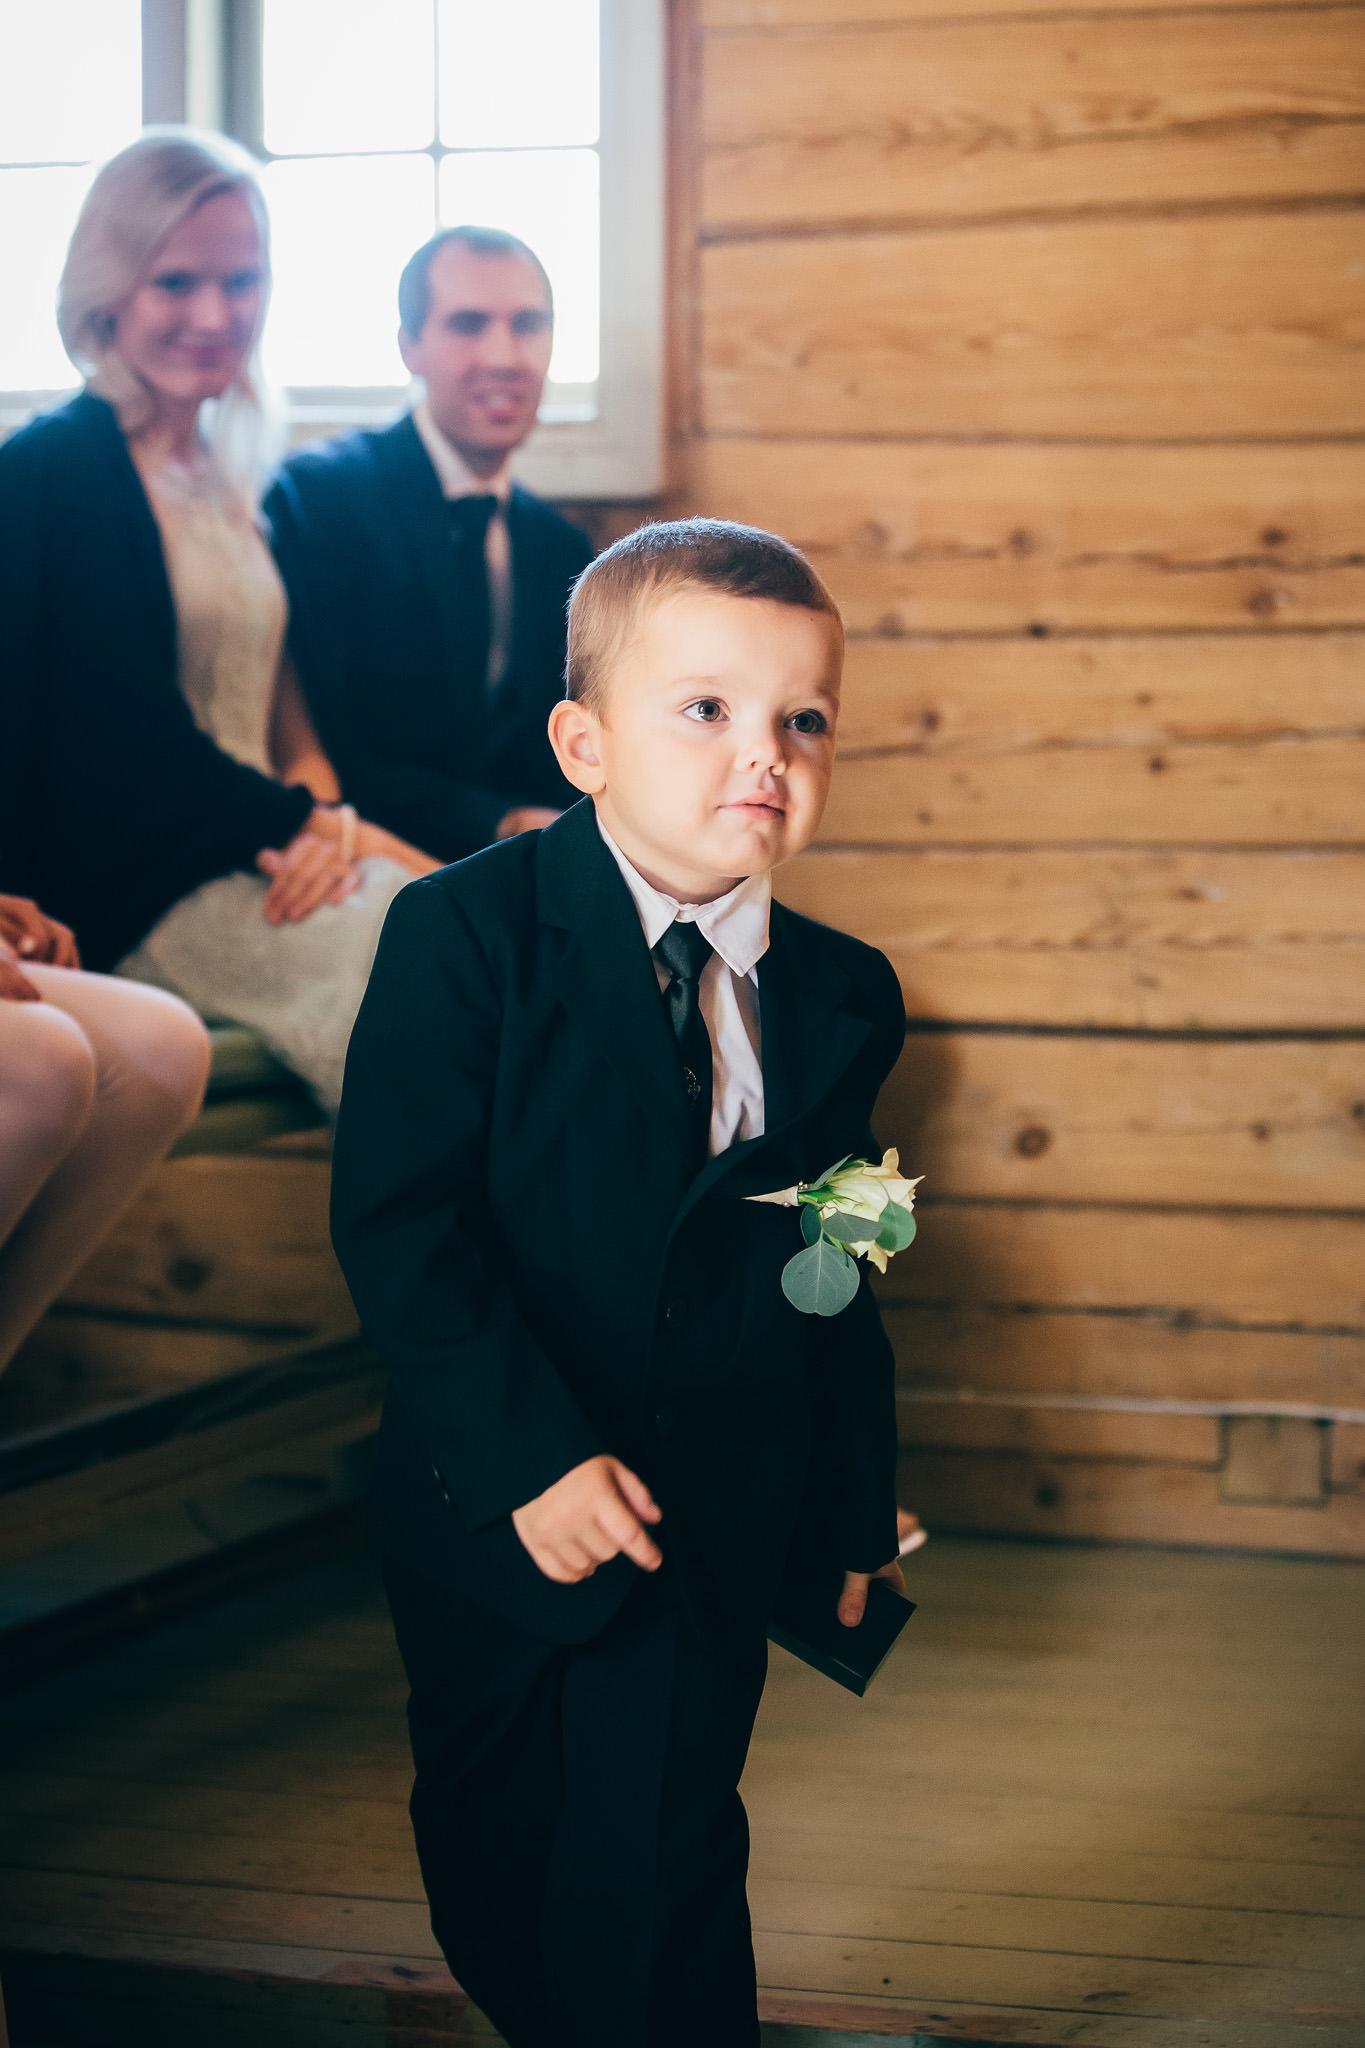 Wedding+Photographer+Norway+Bryllupsfotograf+Casey+Arneson+JT-52.jpg